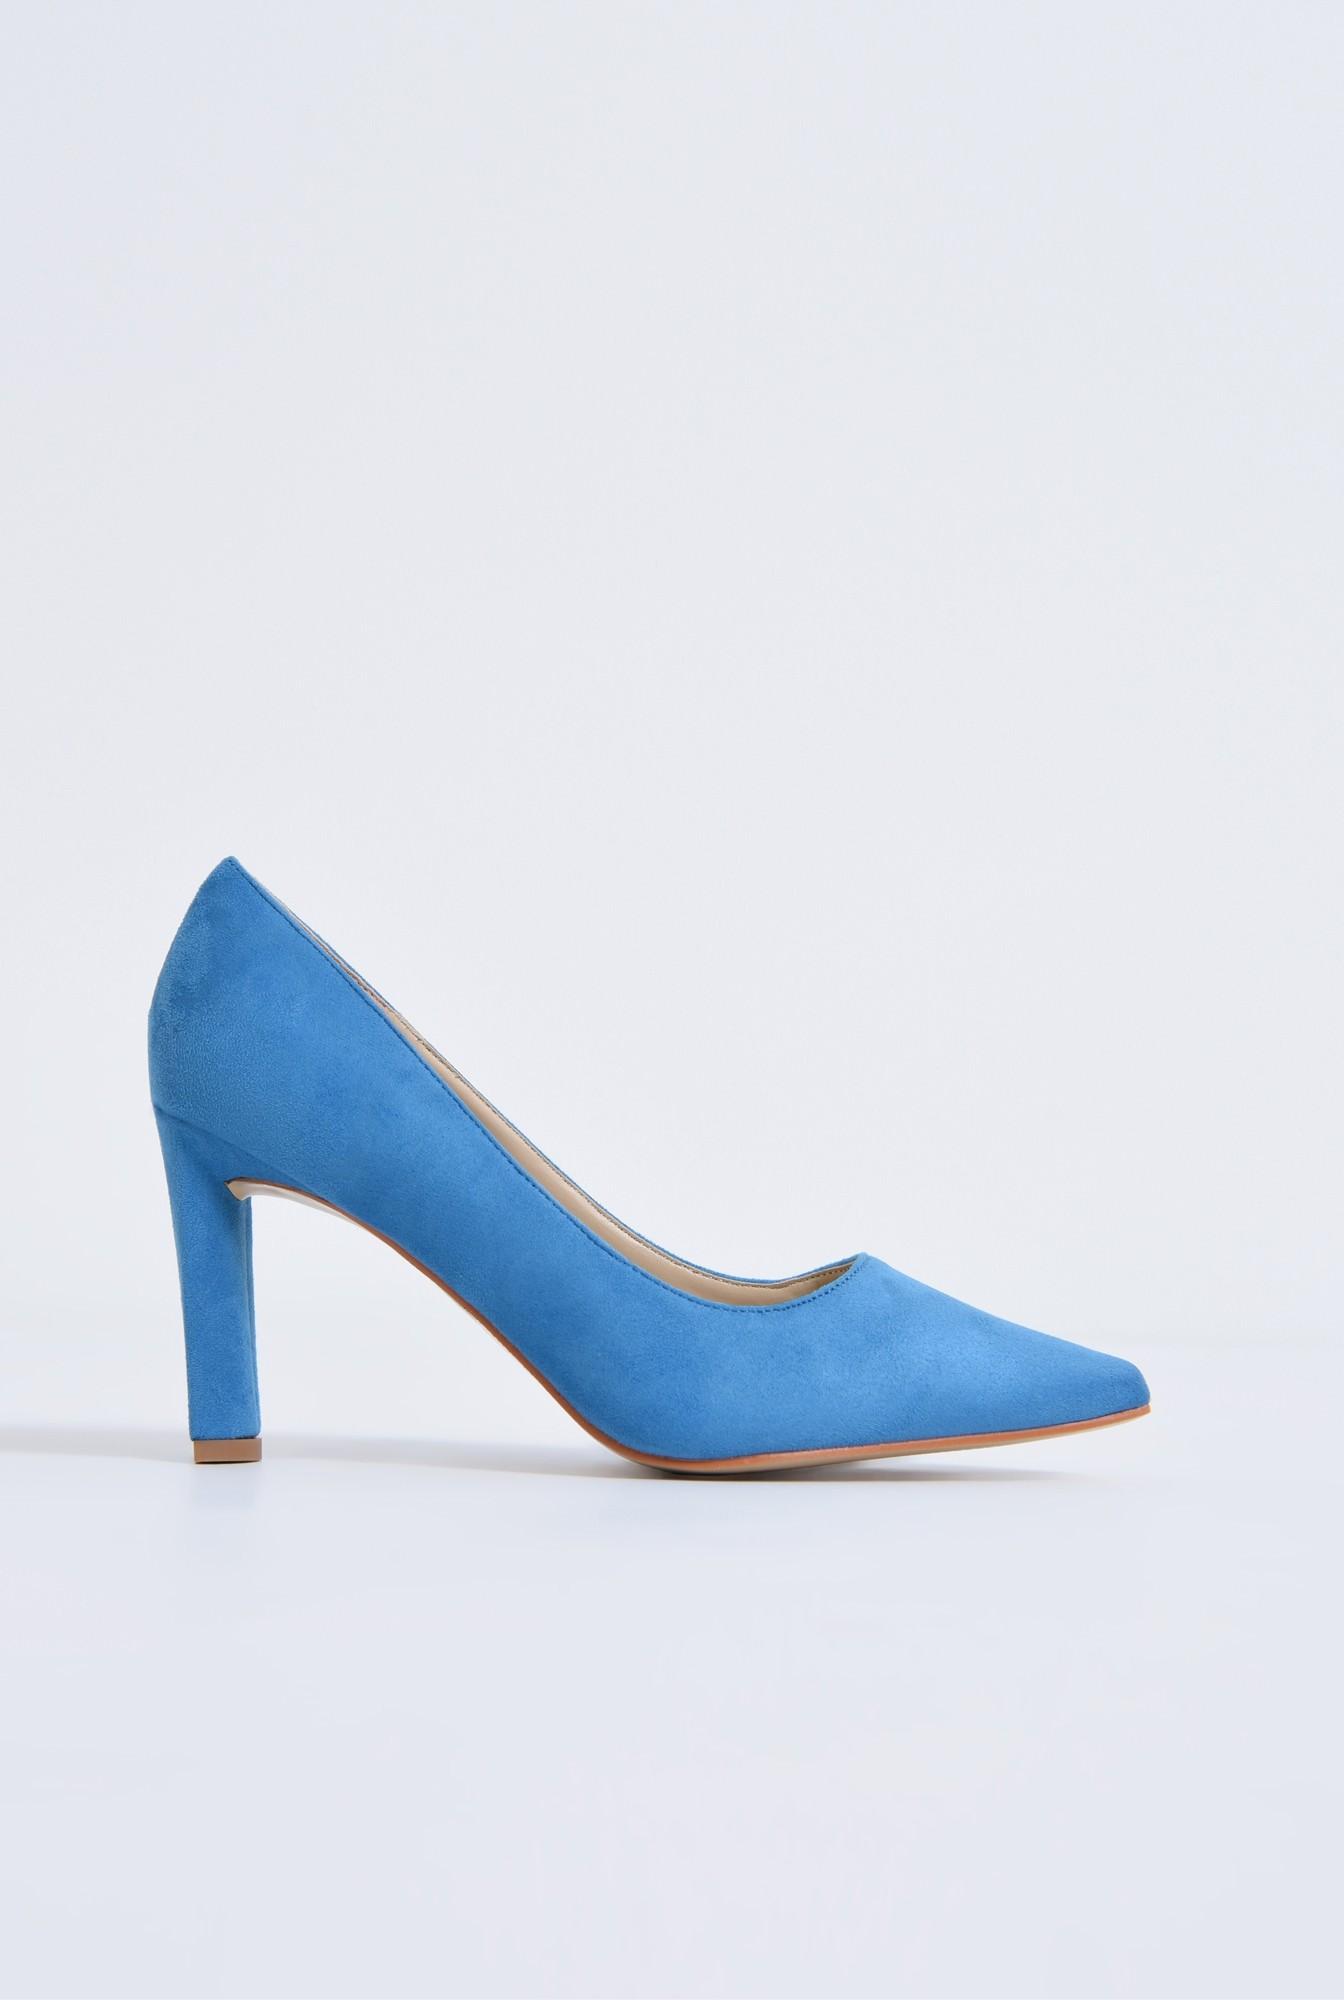 0 - pantofi casual, bleu, toc drept, piele intoarsa